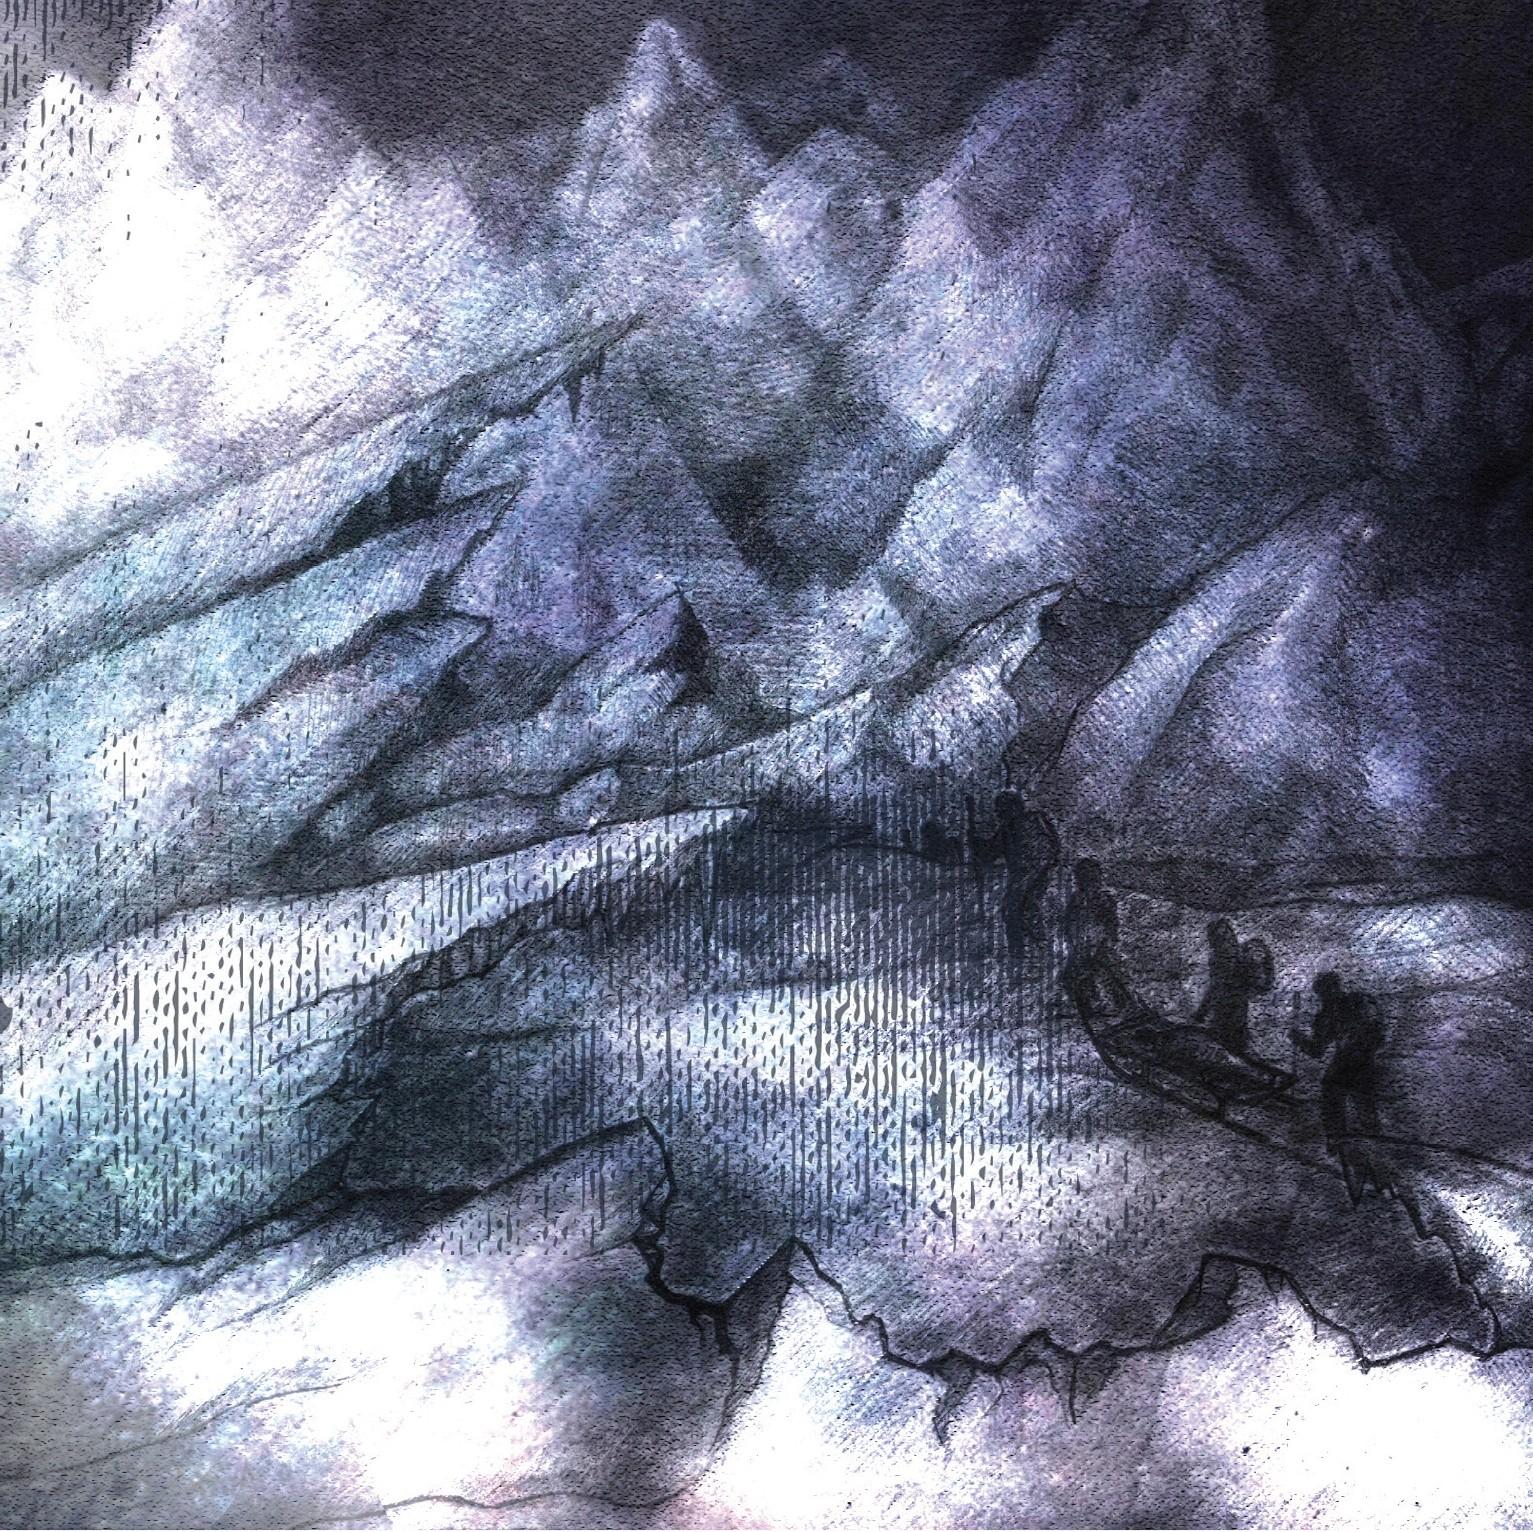 WINTERARR / DZÖ - NGA - Into the Heart of the Ice DigiPak CD